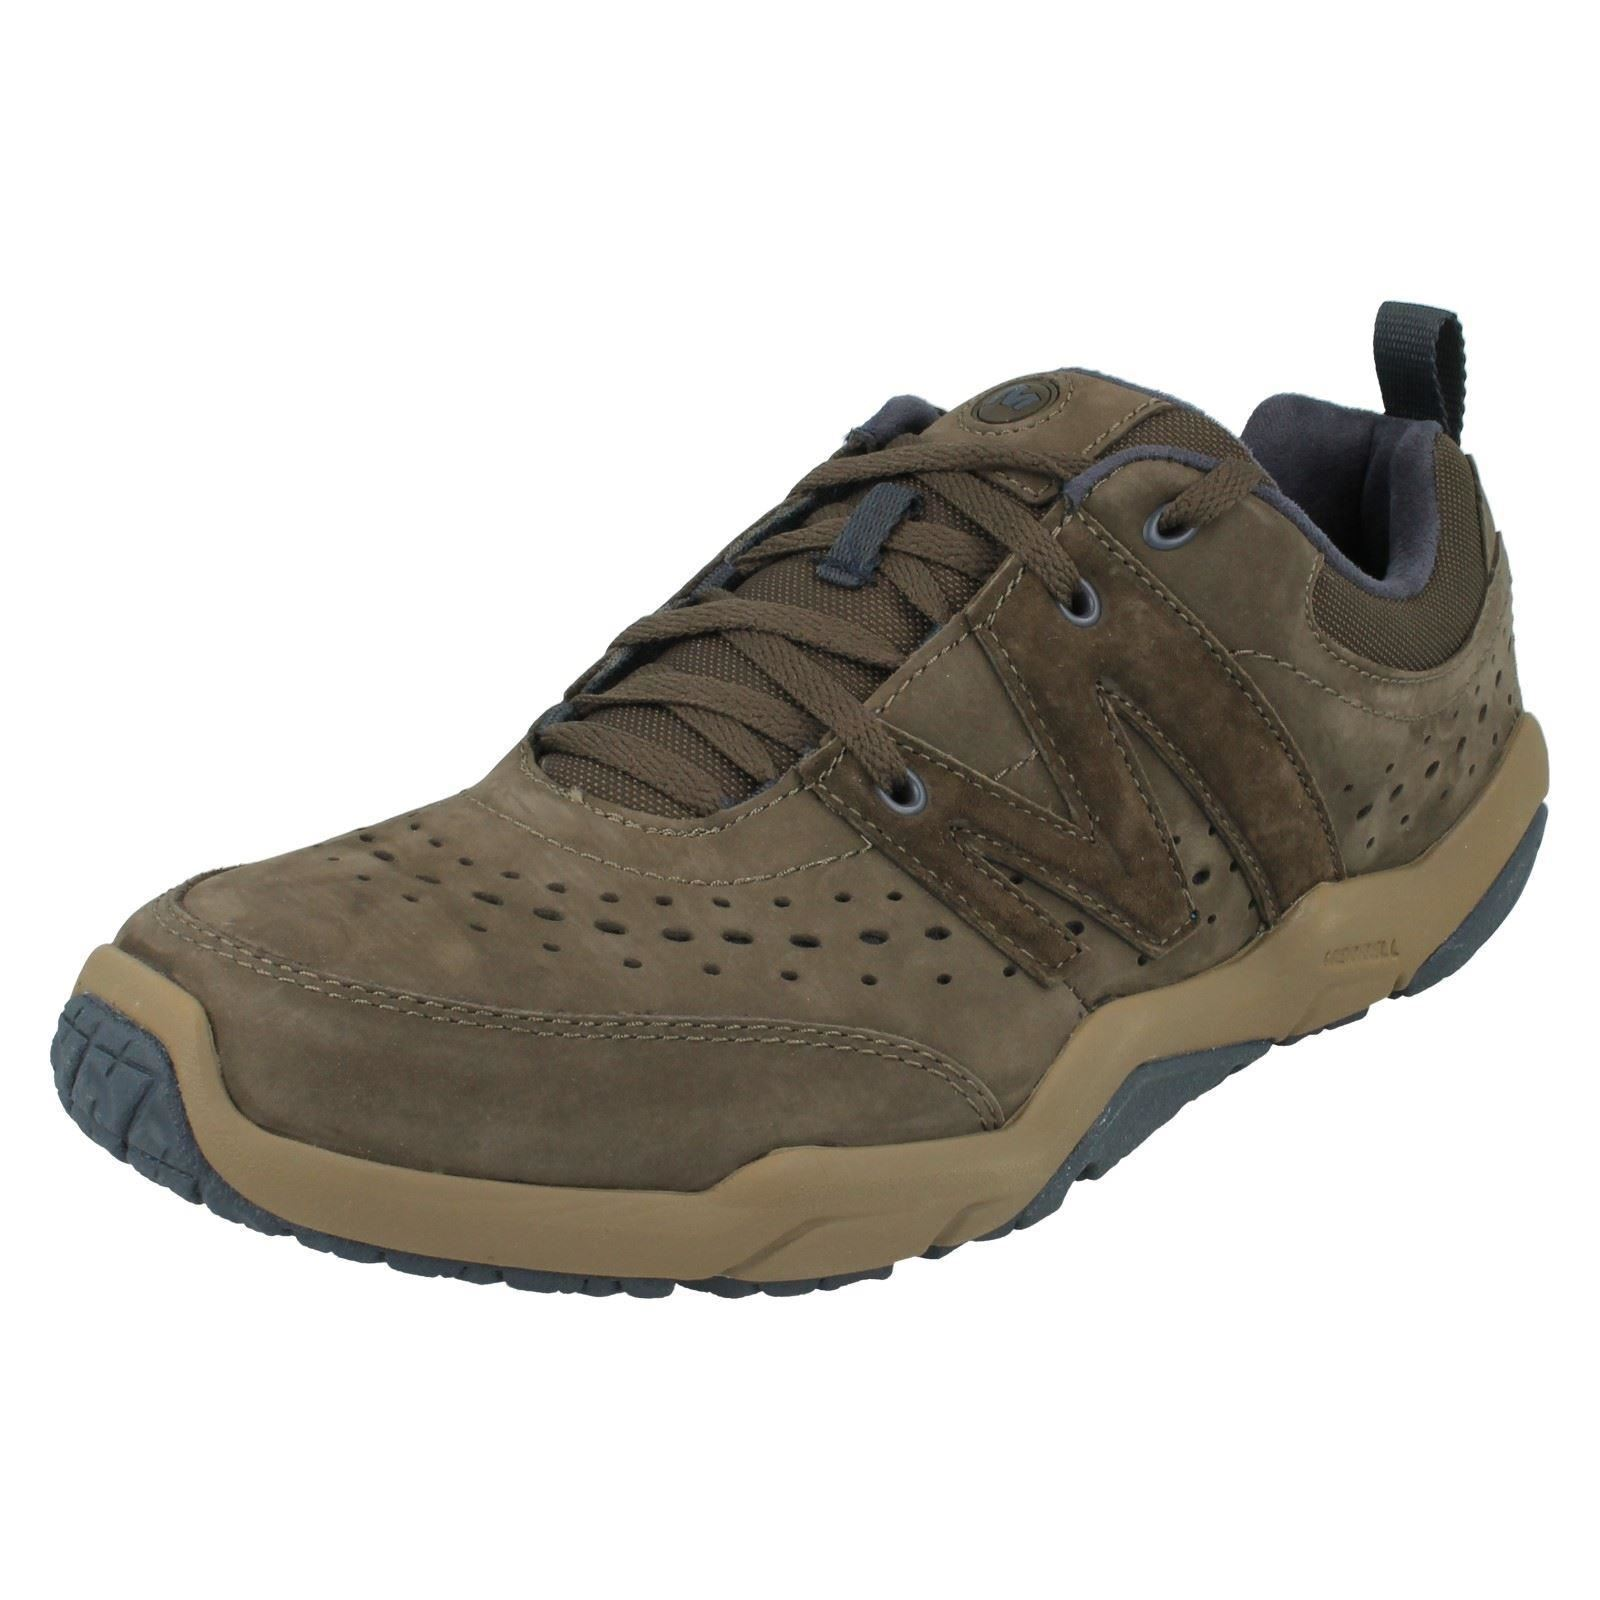 Mens Merrell Casual Lace Up Shoes 'Skylark J553251'